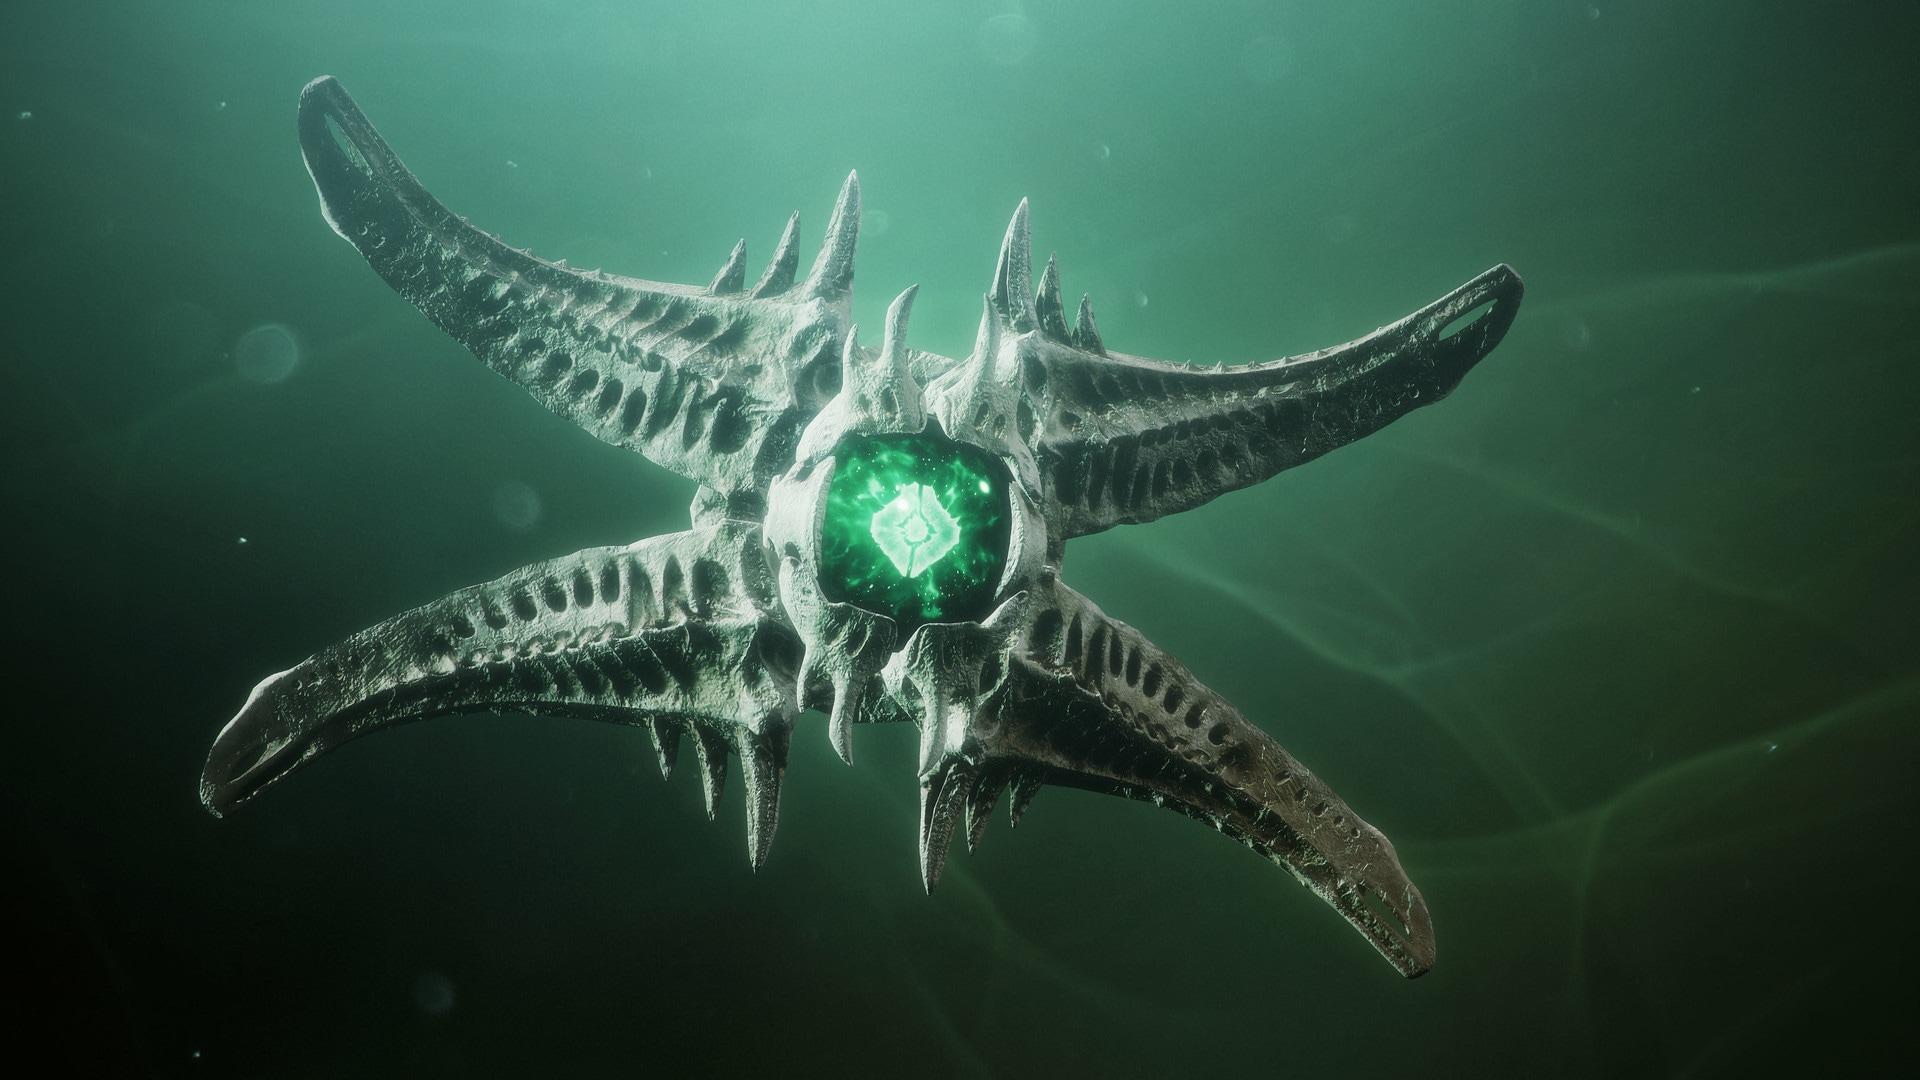 Destiny 2: The Witch Queen (PC) - Steam Key - RU/CIS - 4